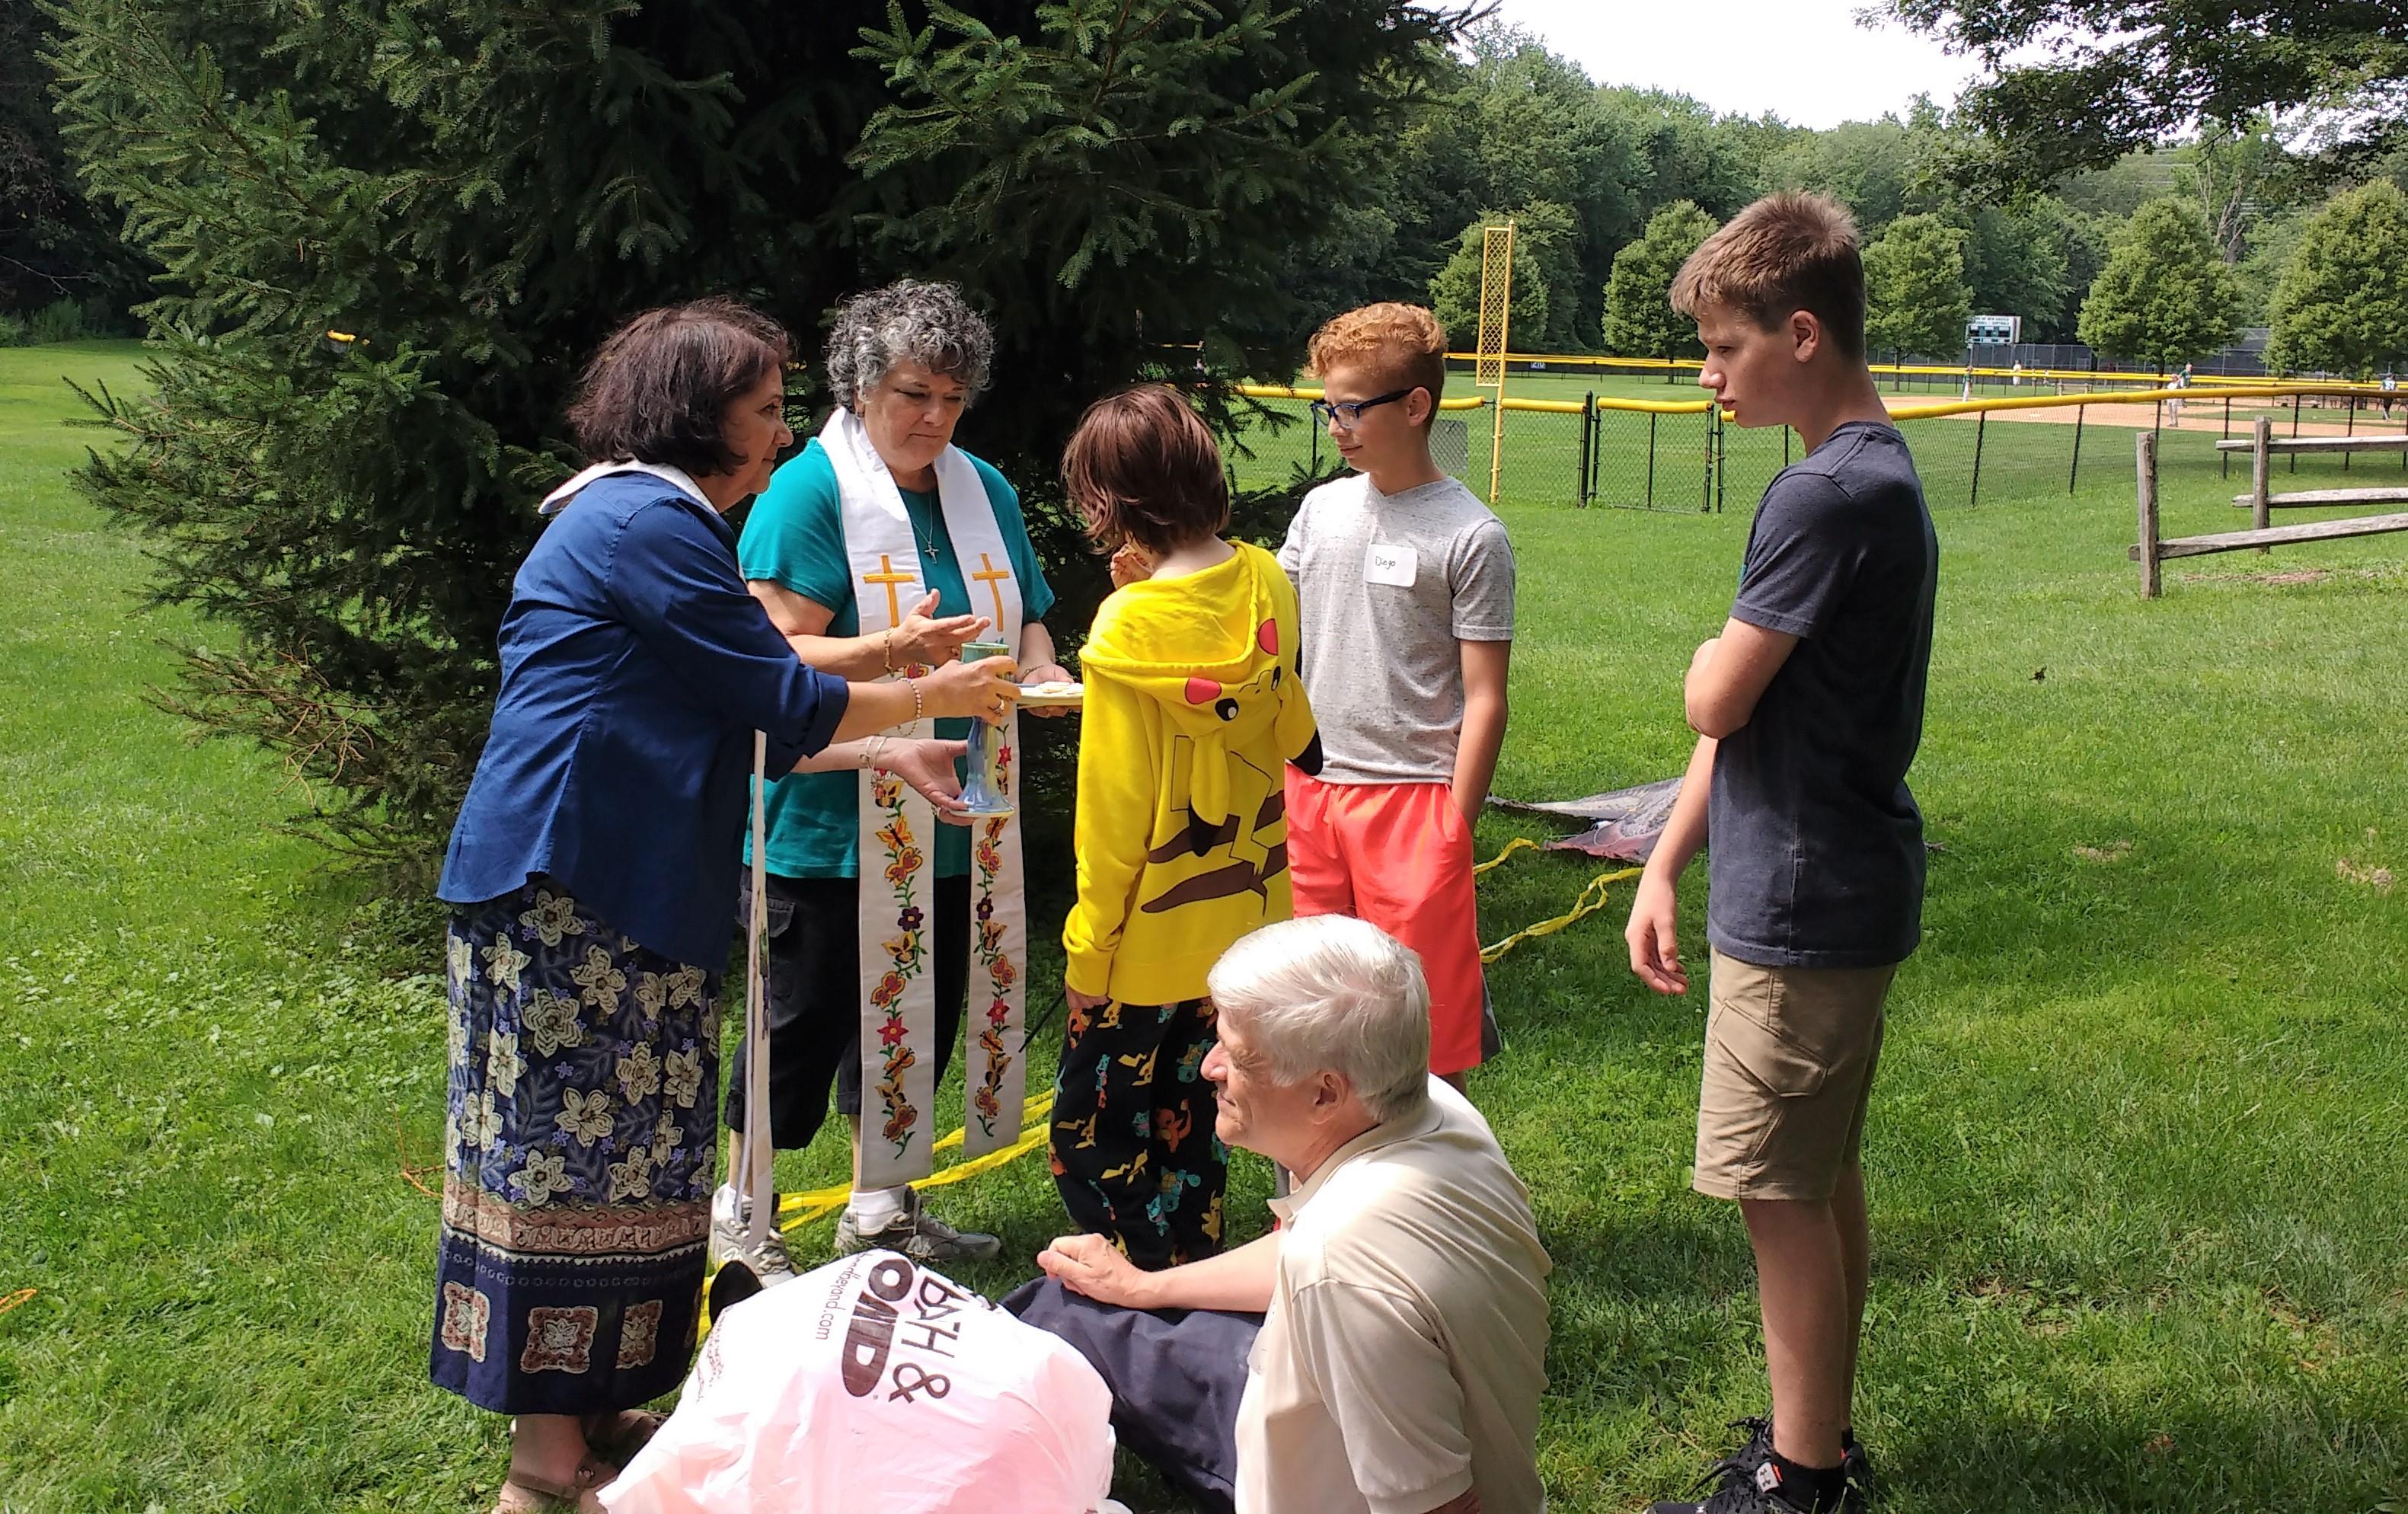 Outdoor Summer Worship & Picnic